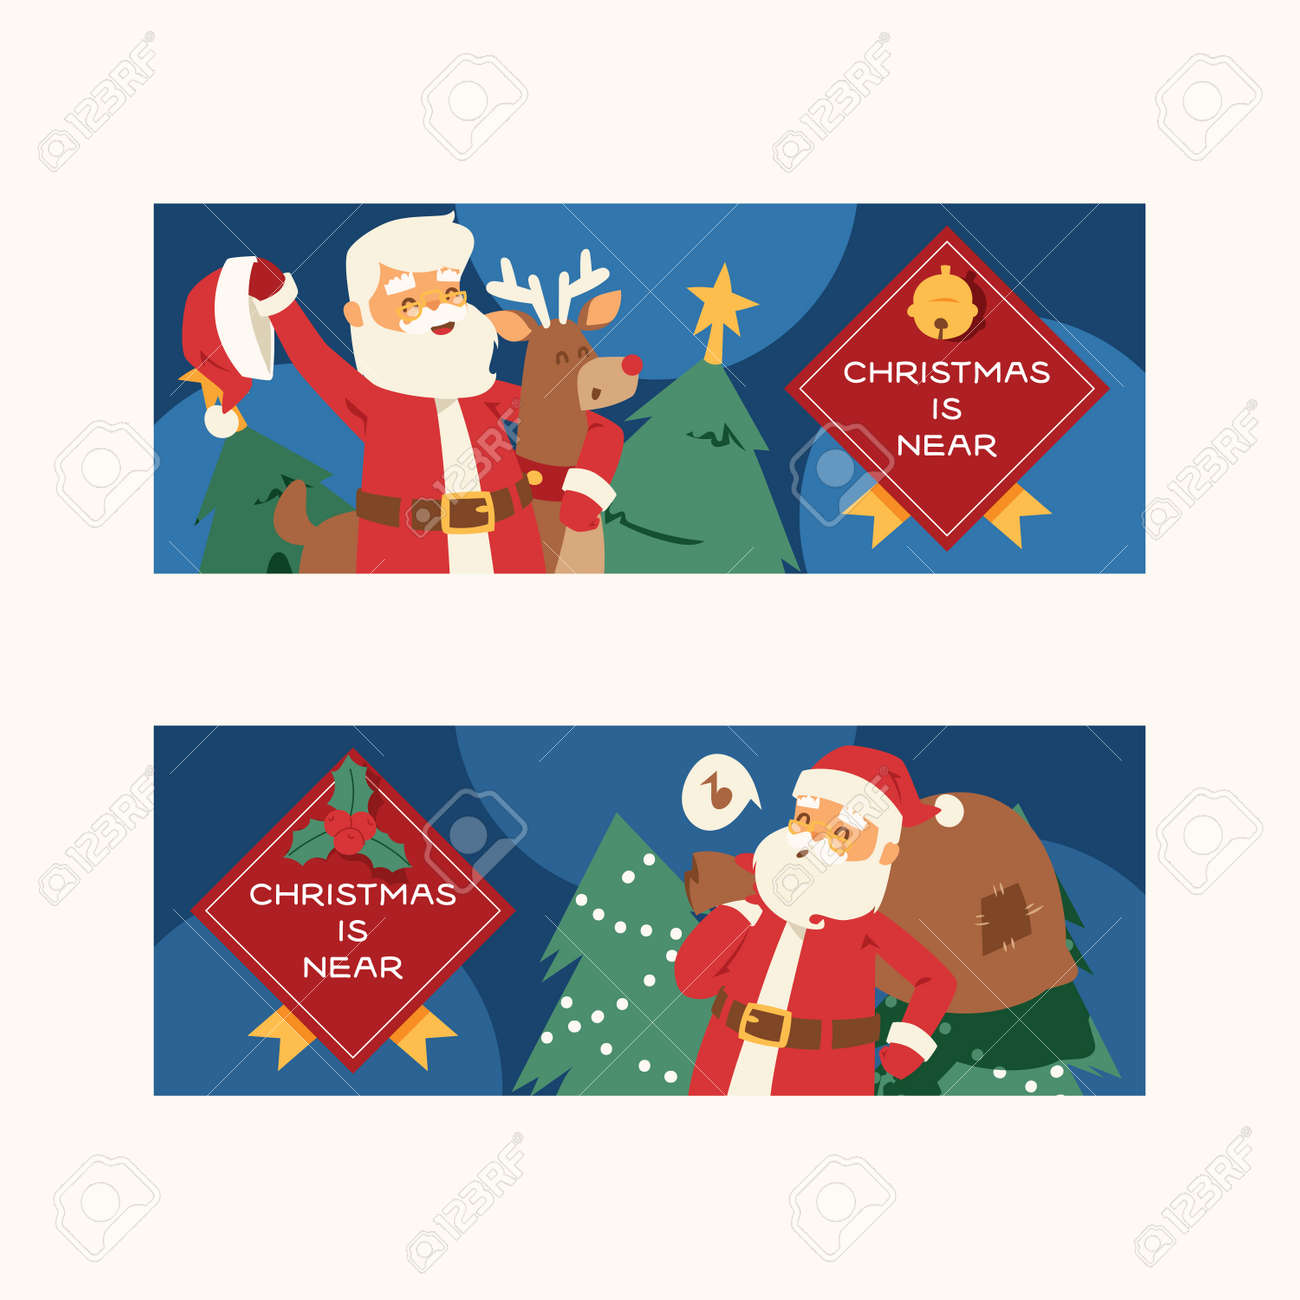 christmas 2019 happy new year greeting card santa claus vector background banner holidays winter xmas cartoon